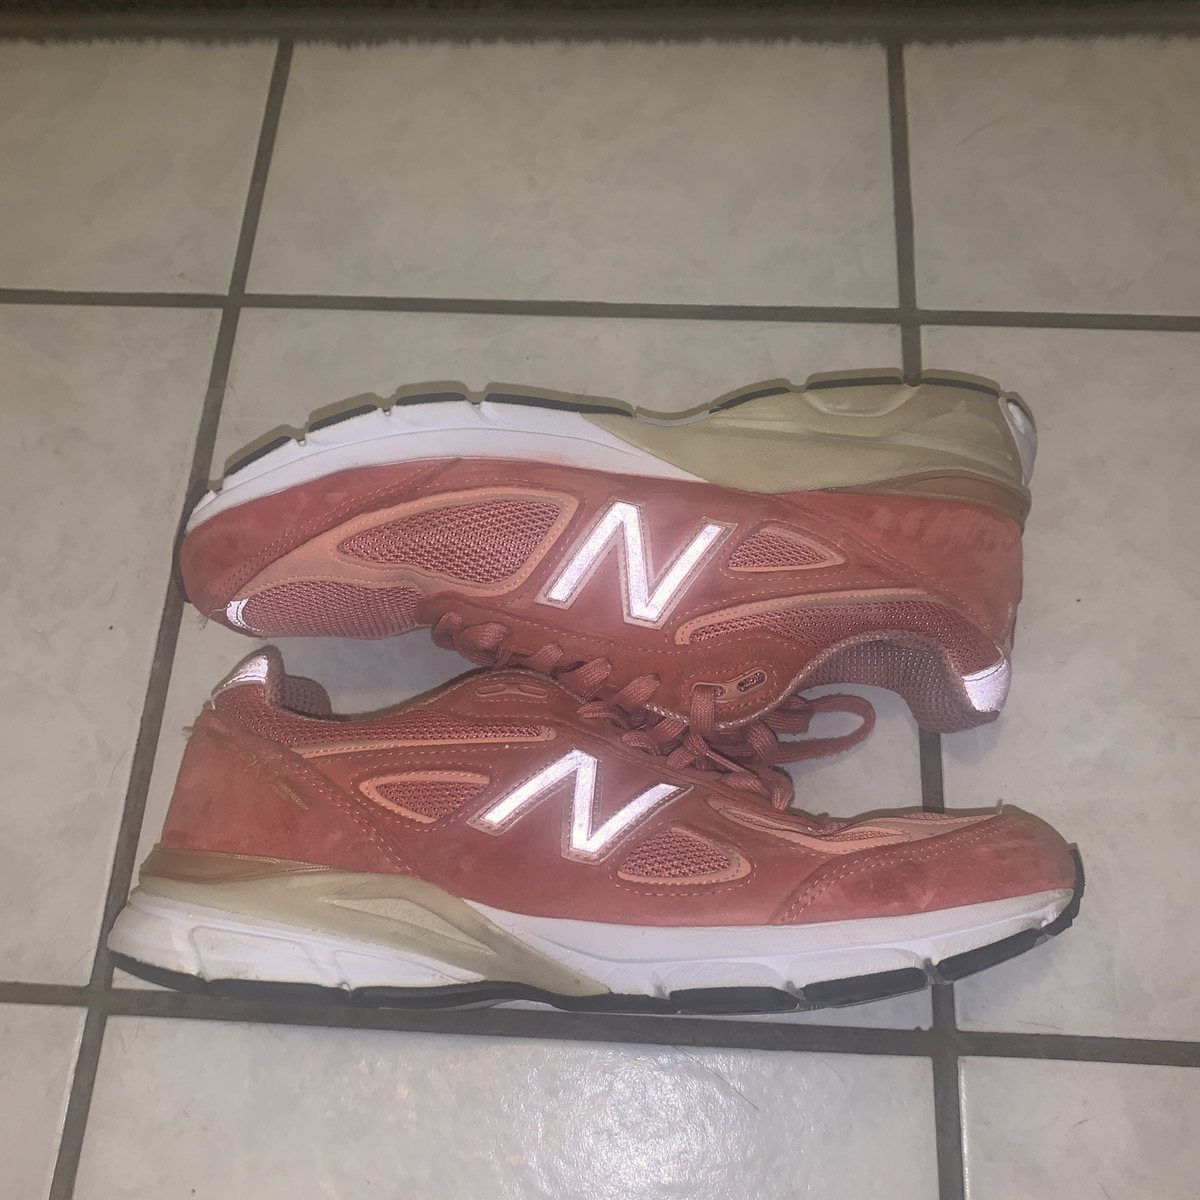 separation shoes 644d6 d3709 New Balance 990 V4 SALMON